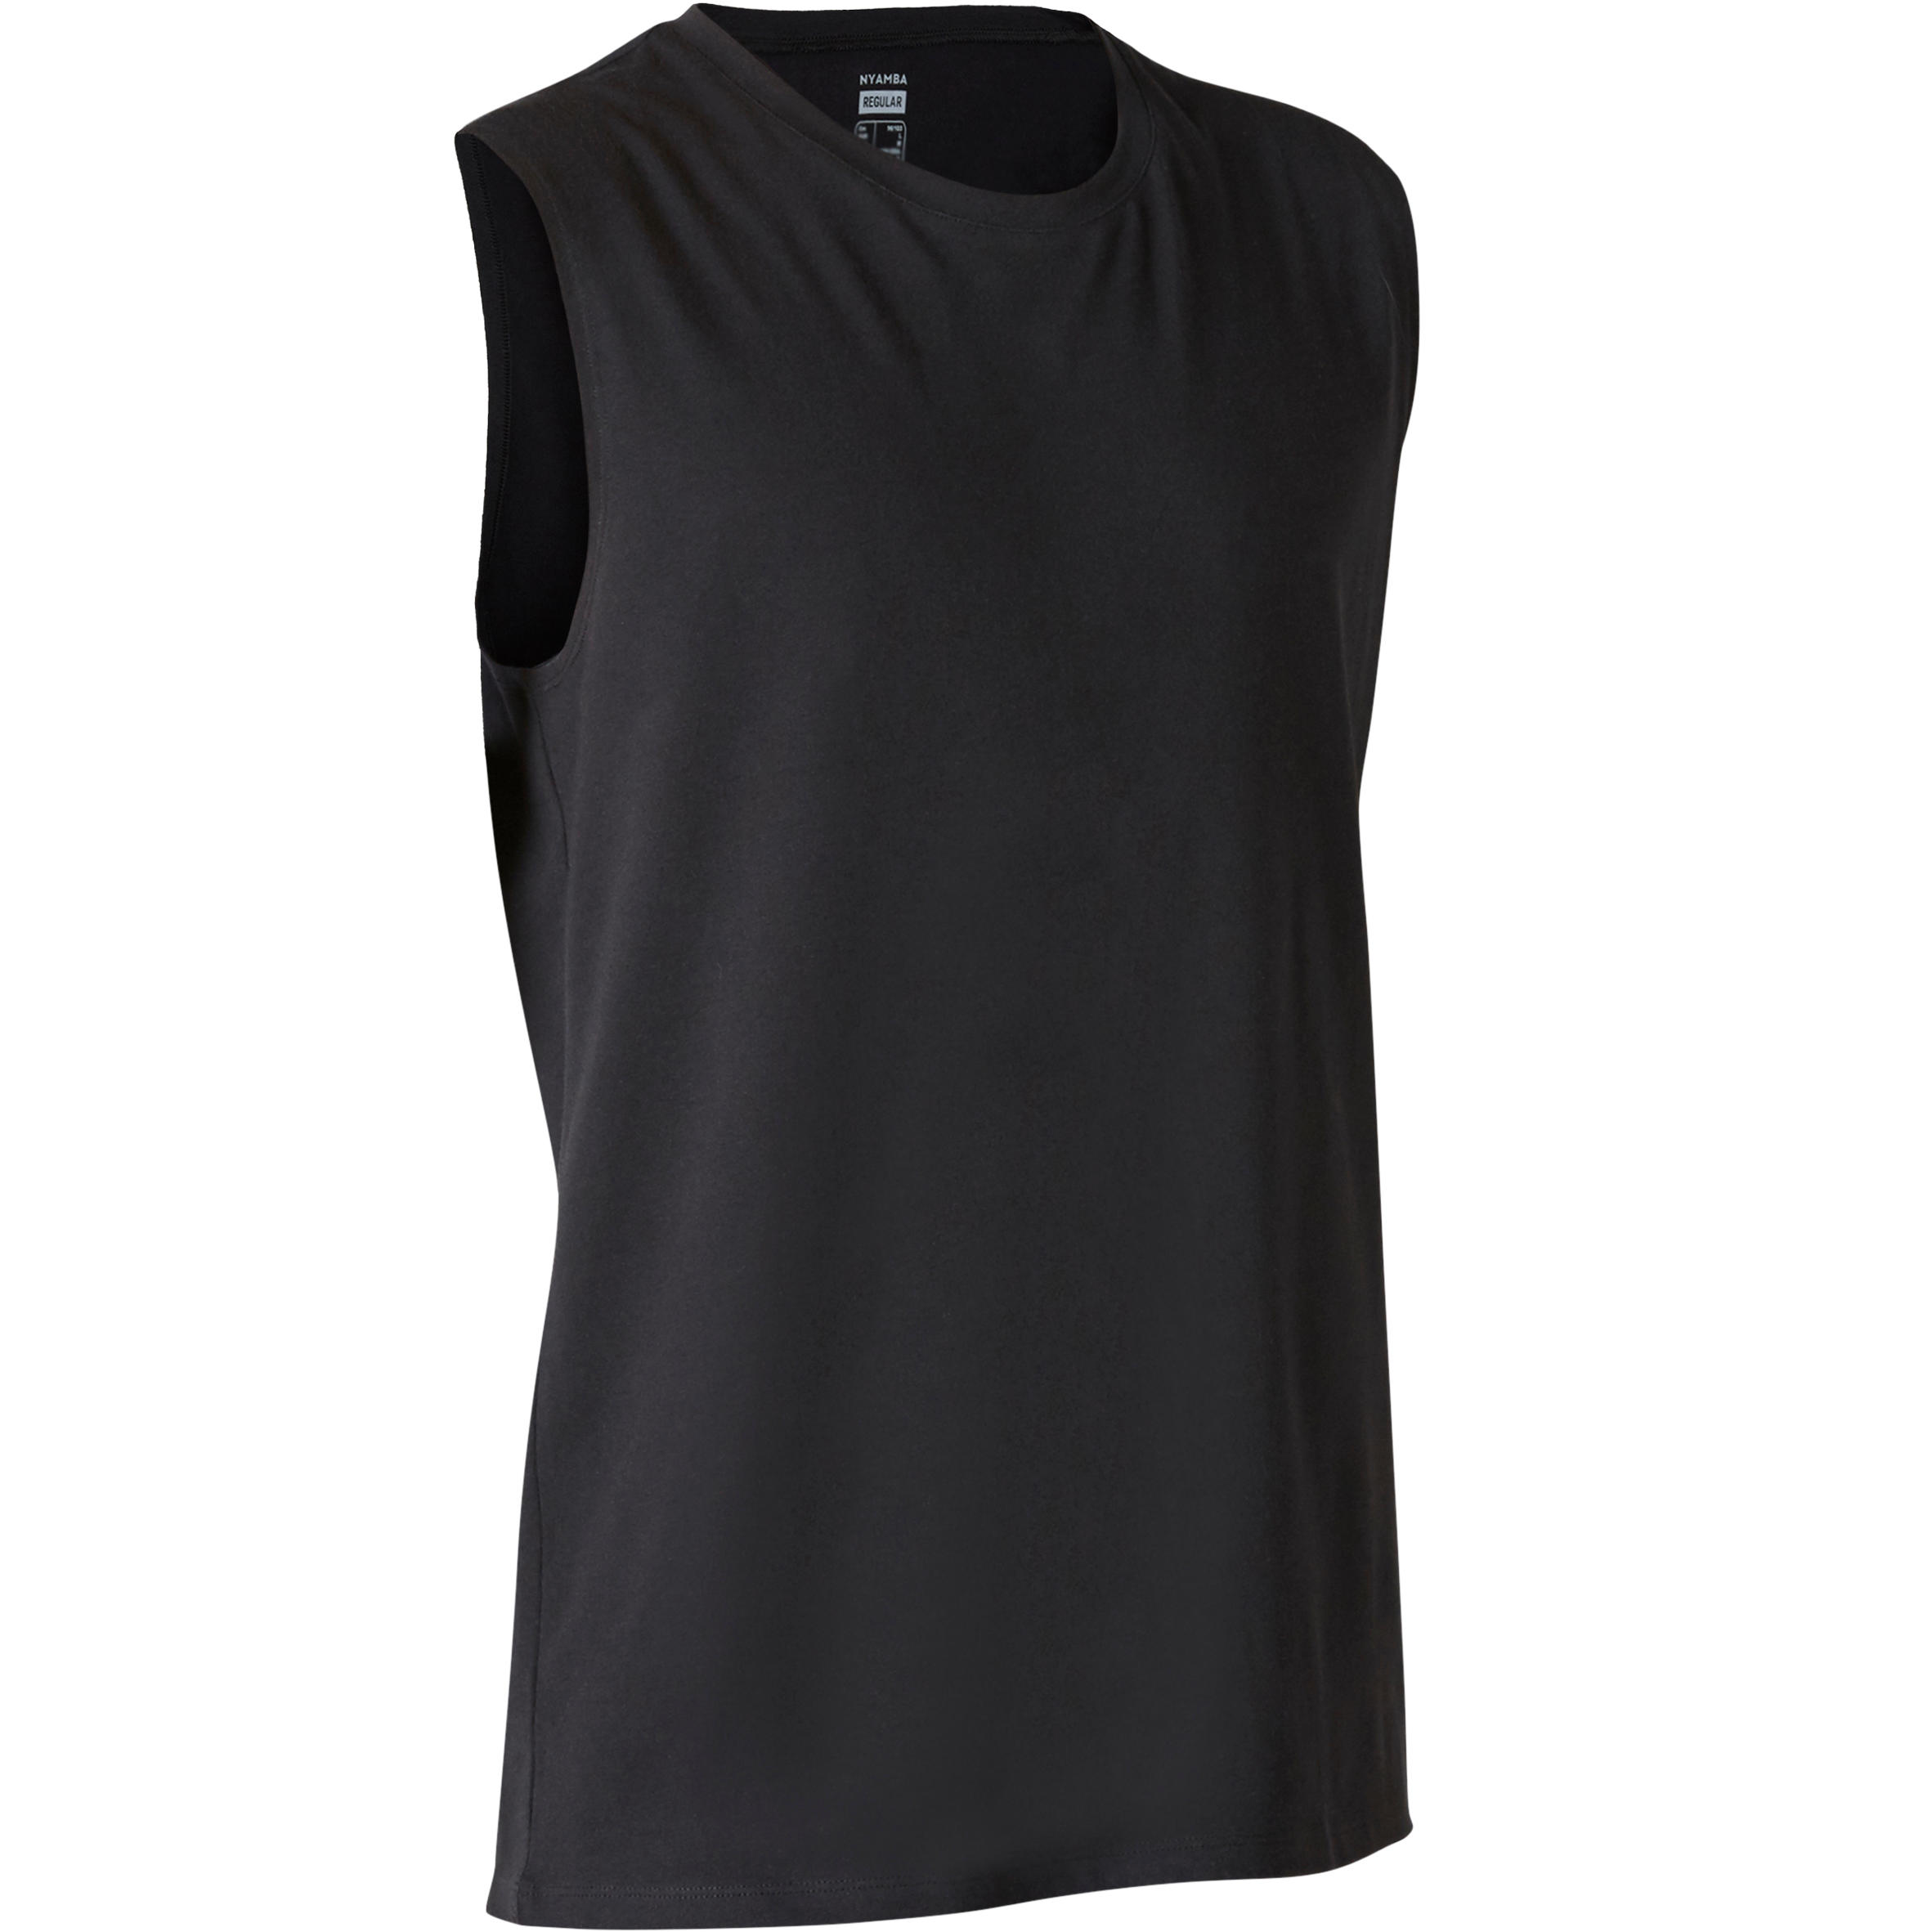 RAGNO Camisole Man Short Sleeve Tank Round-Neck Shirt in 100/% Merino Wool Item 003157